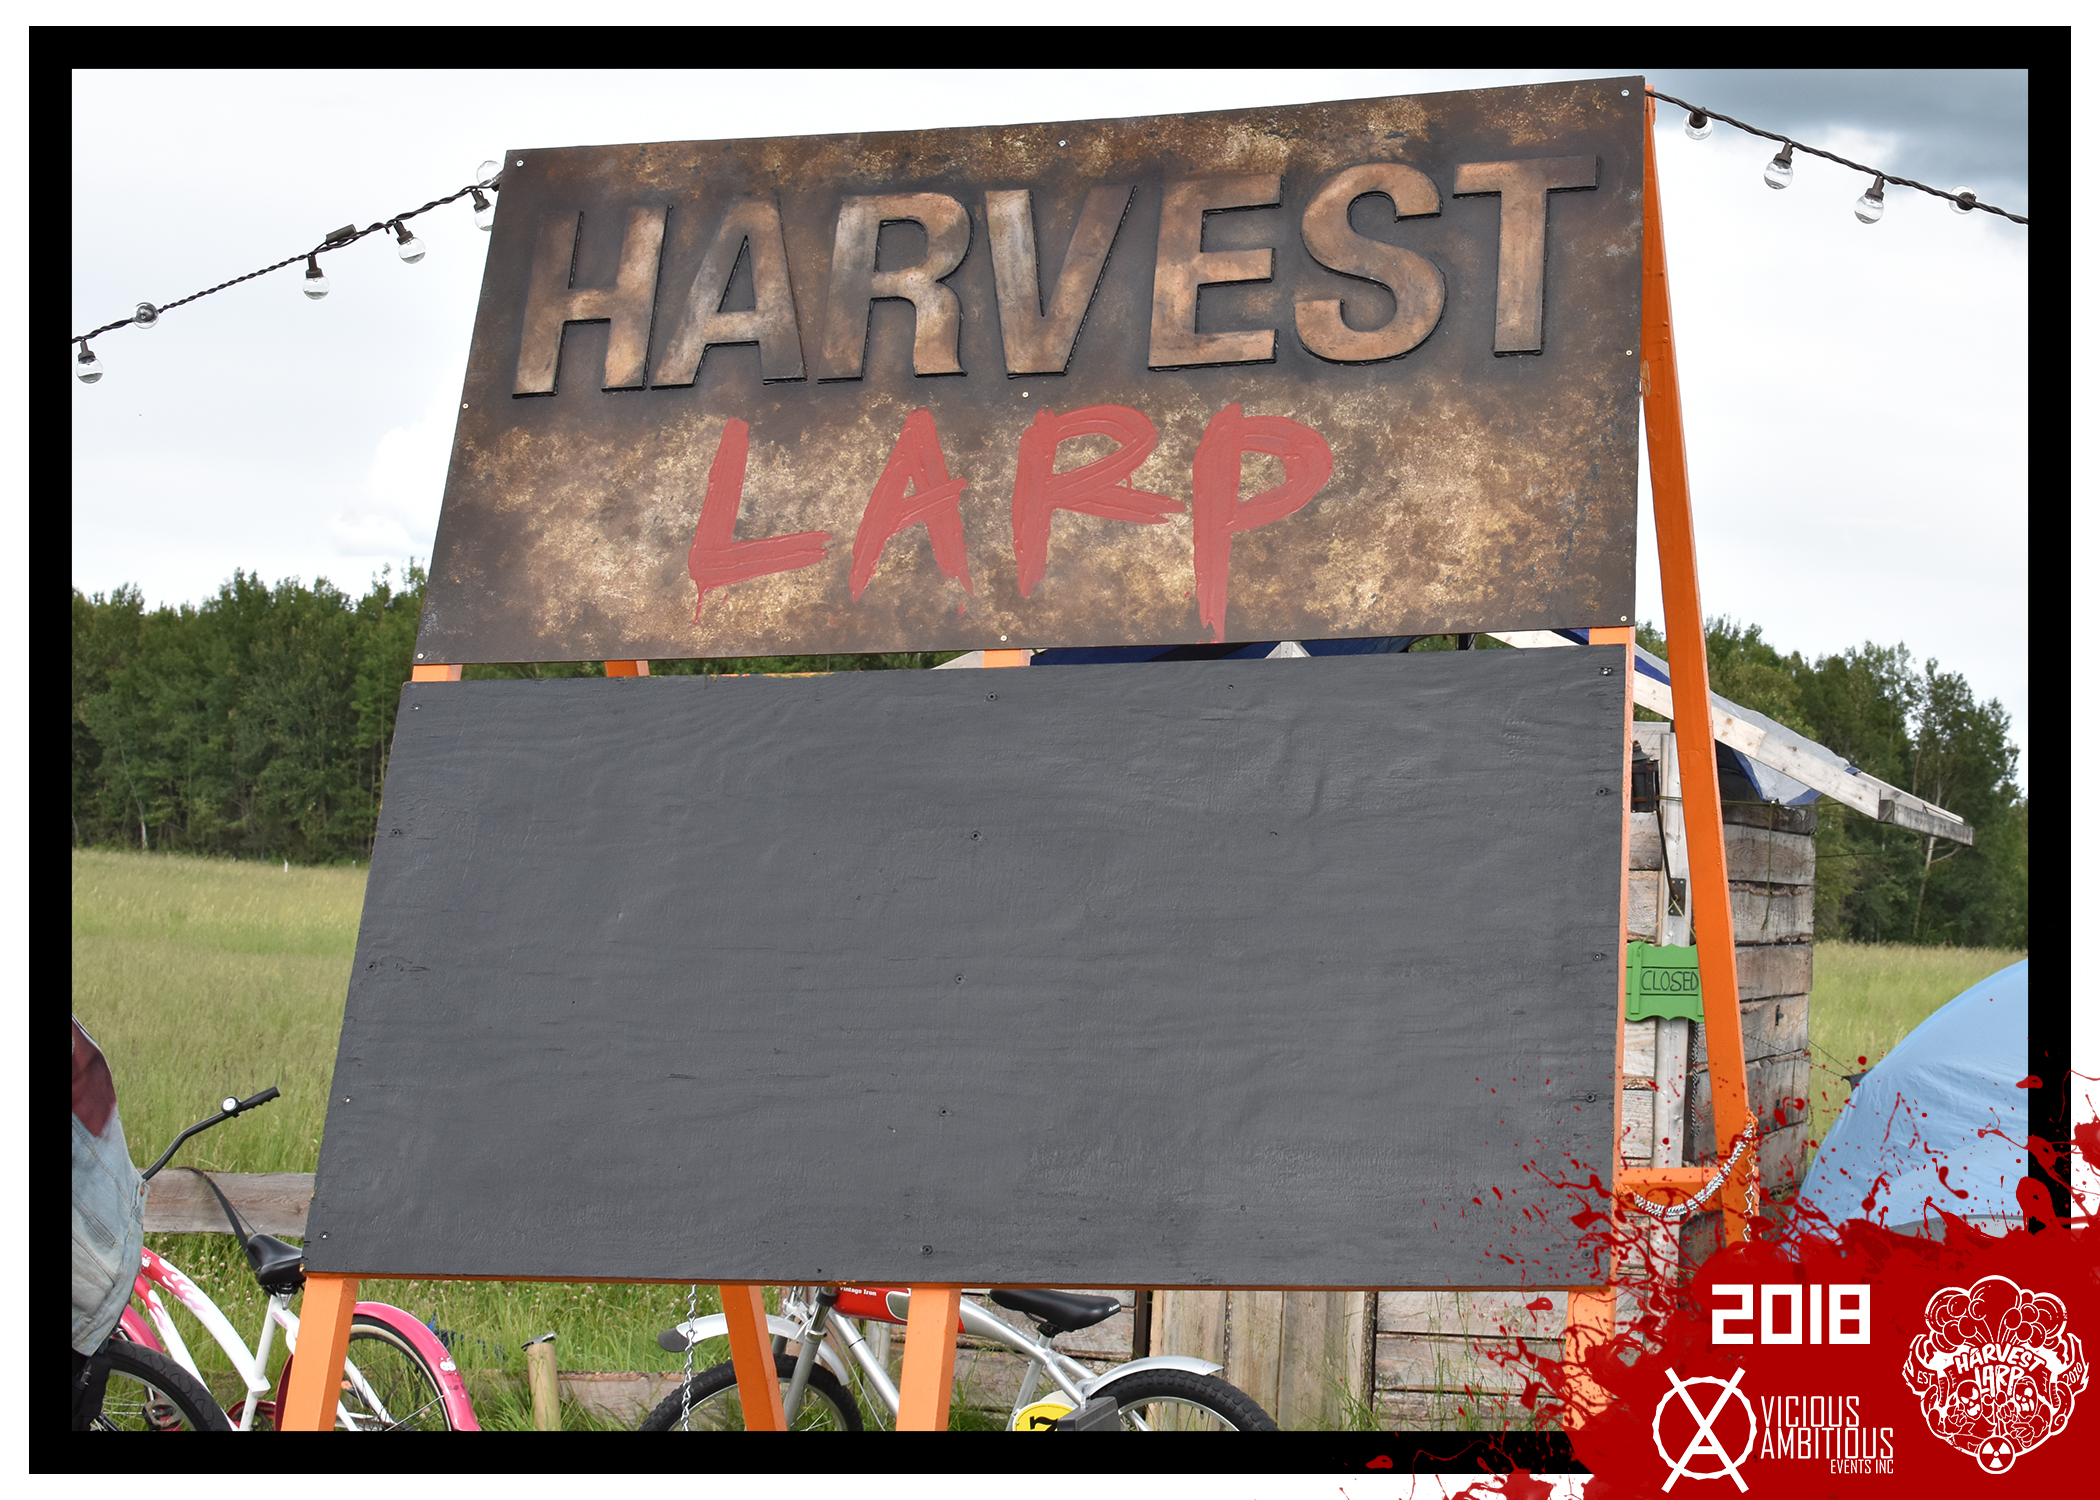 Harvest LARP 2018 Edited 23